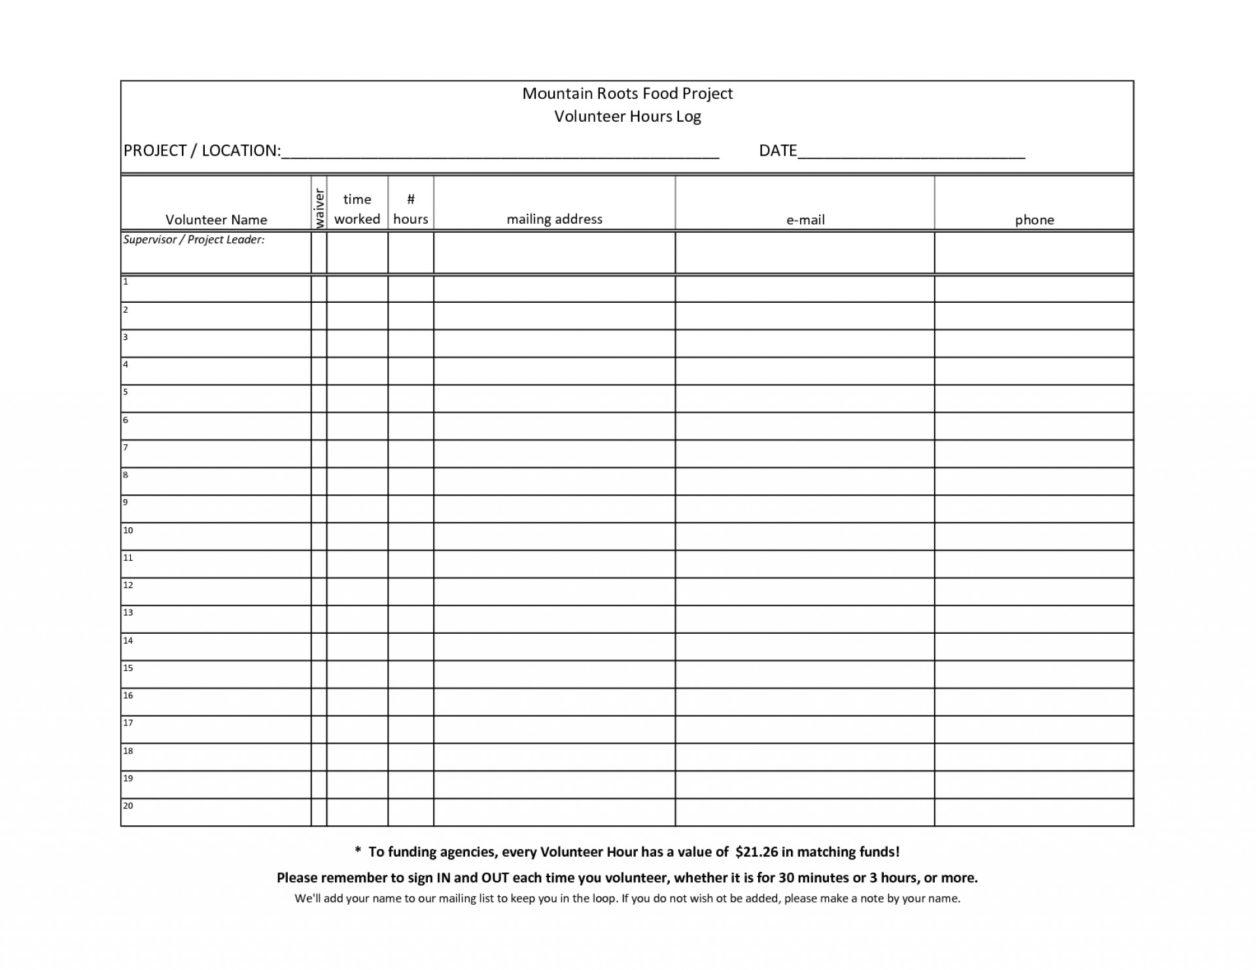 Volunteer Spreadsheet Excel Inside 015 Template Ideas Volunteer Hours Log Time Excel Awesome Best